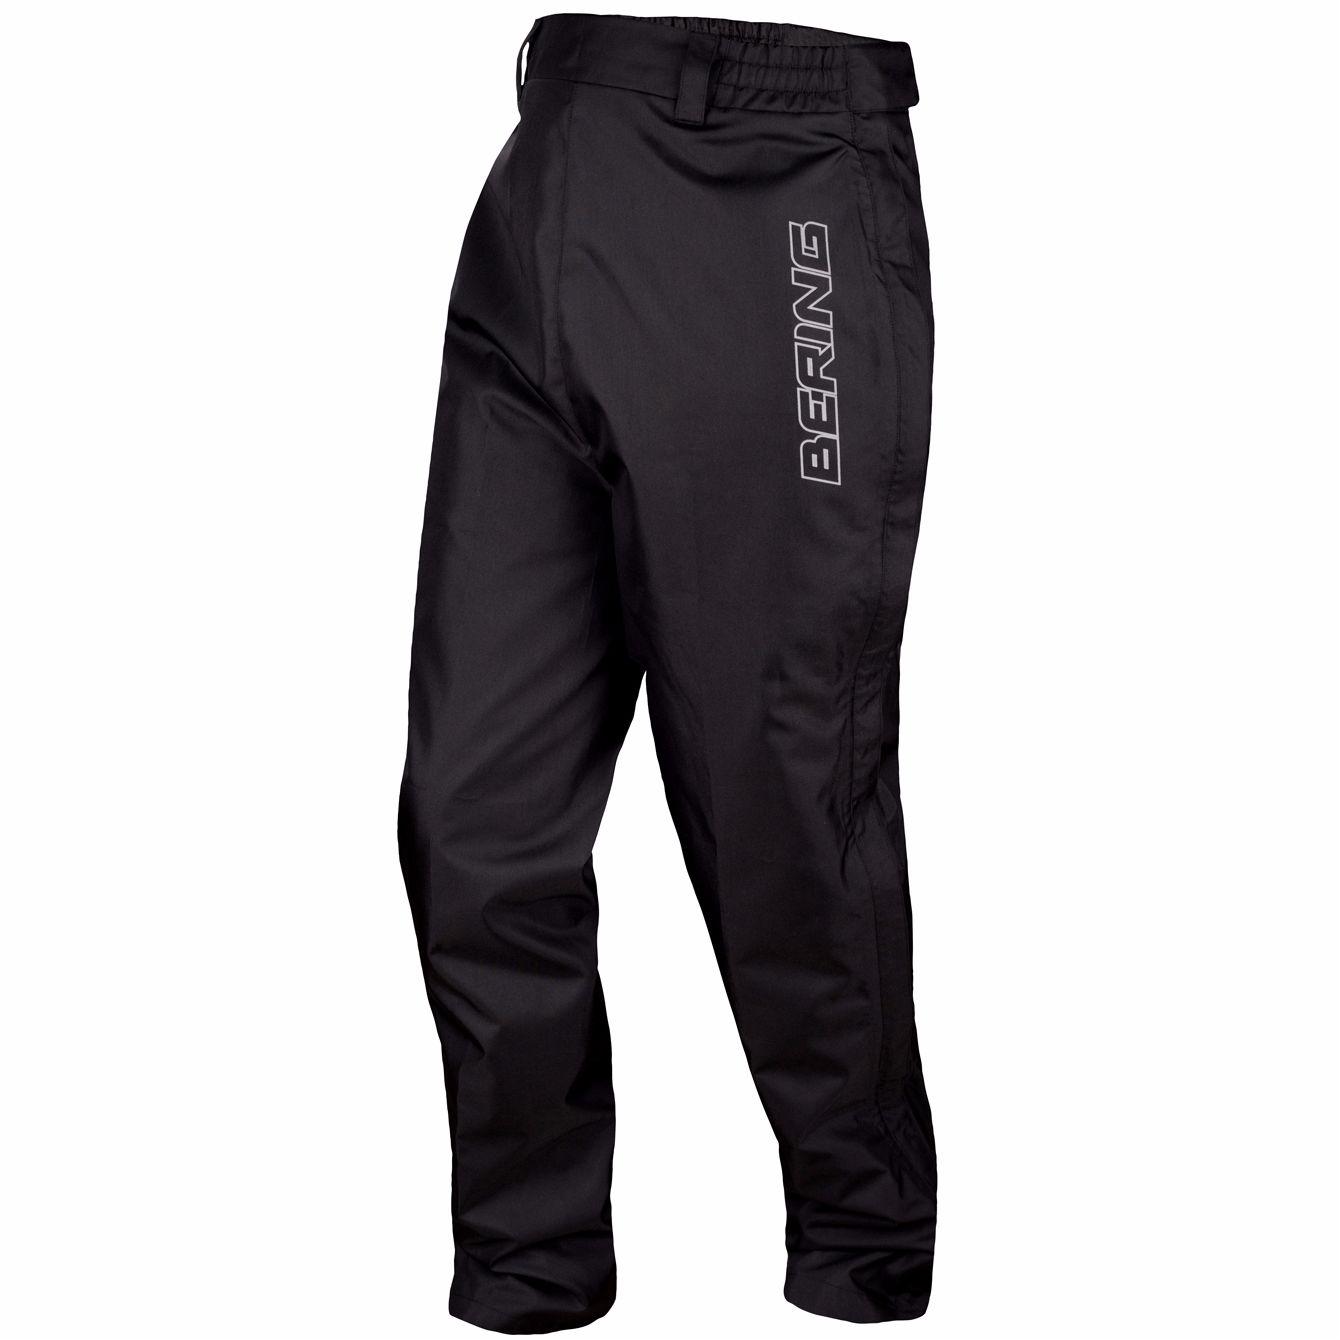 pantalon bering quick pantalon et combinaison. Black Bedroom Furniture Sets. Home Design Ideas